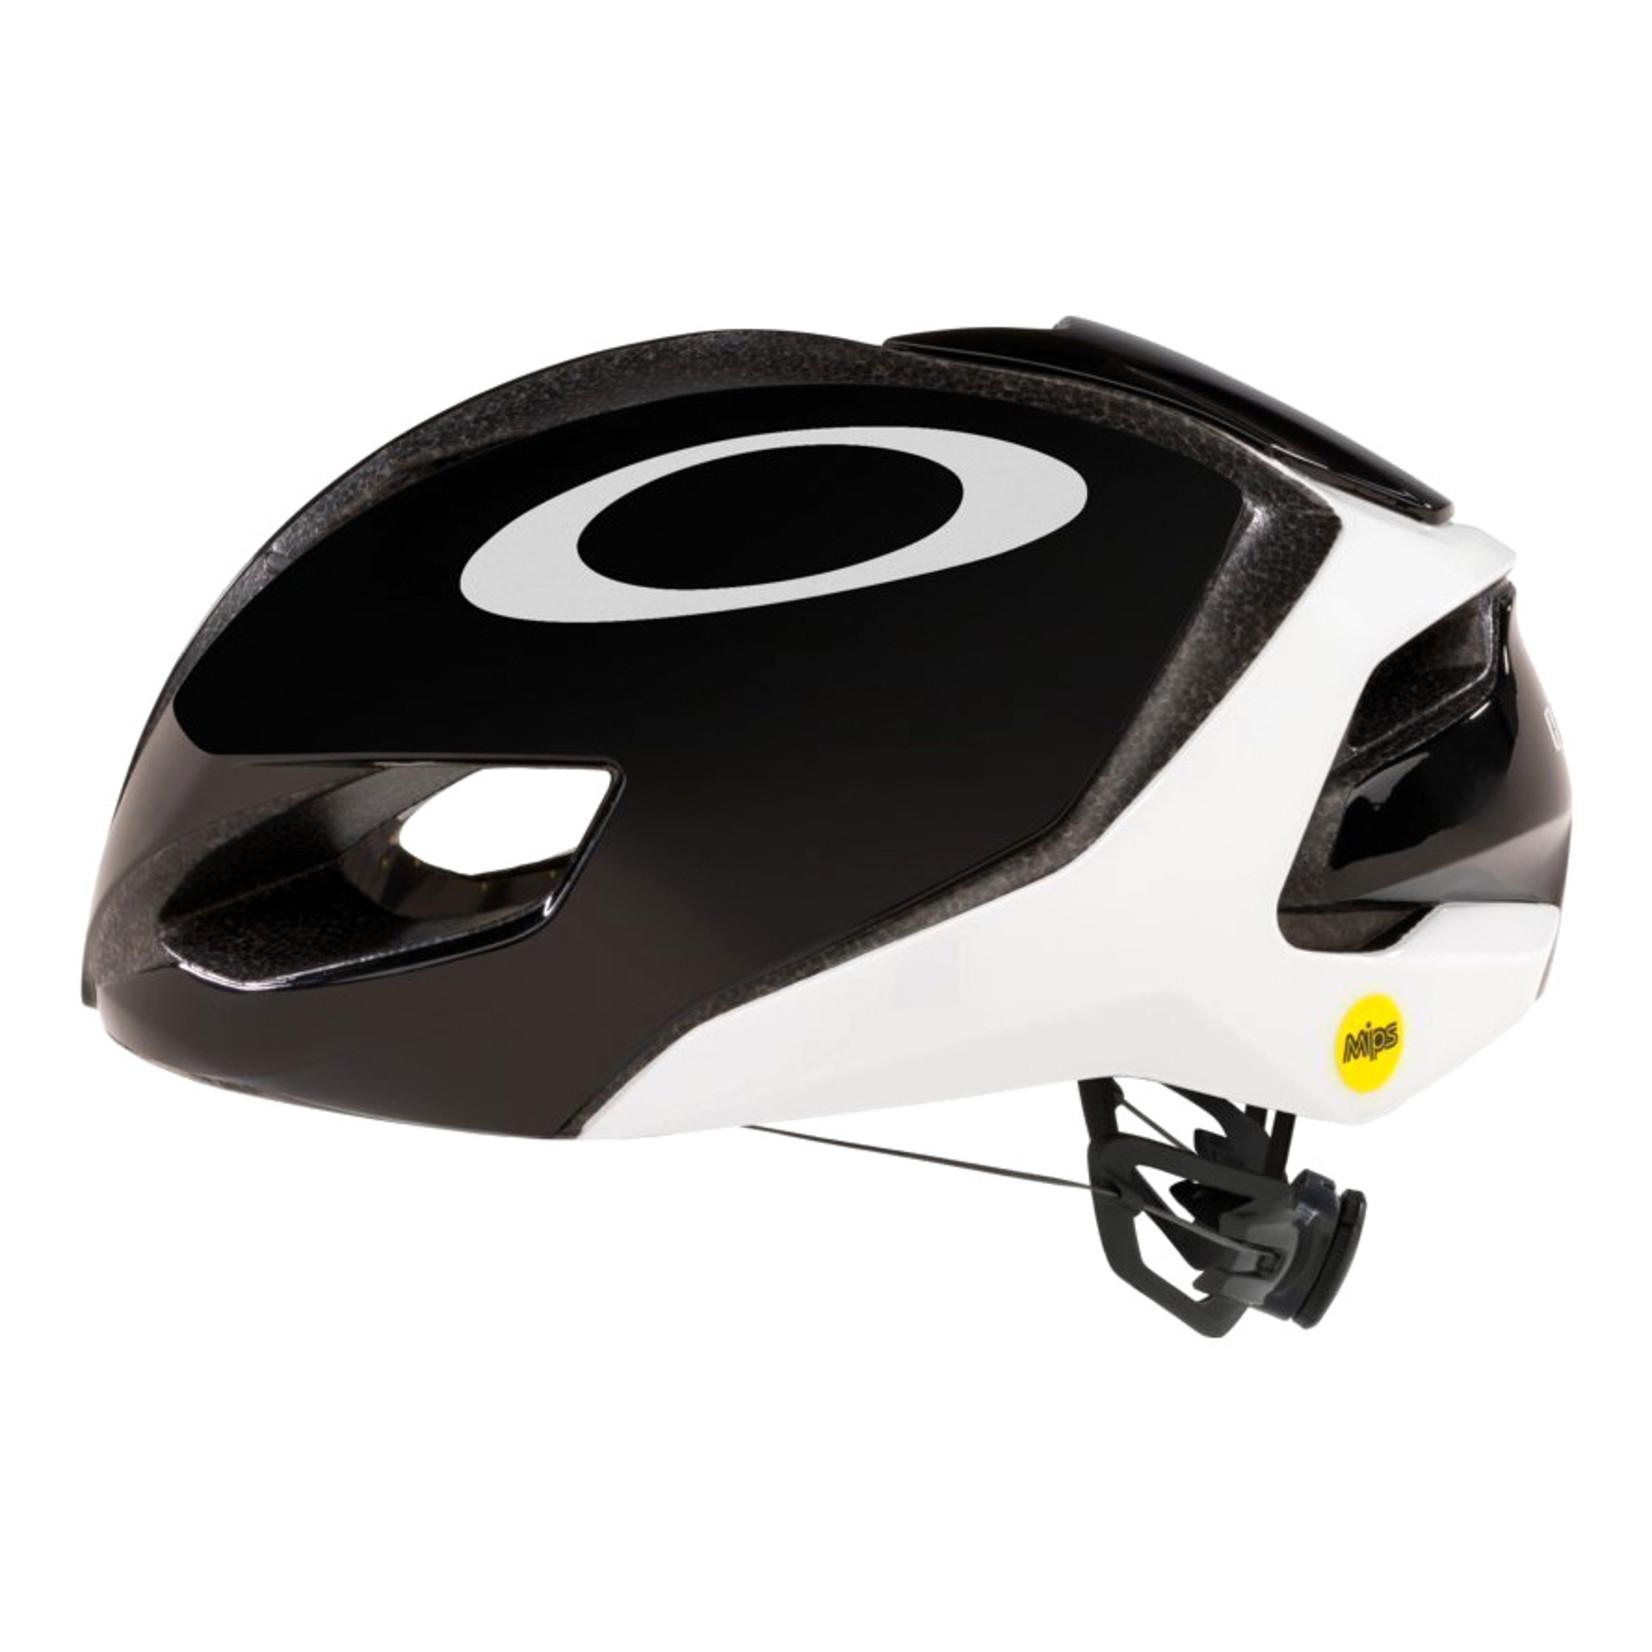 Oakley Oakley ARO5 Black/White MEDIUM